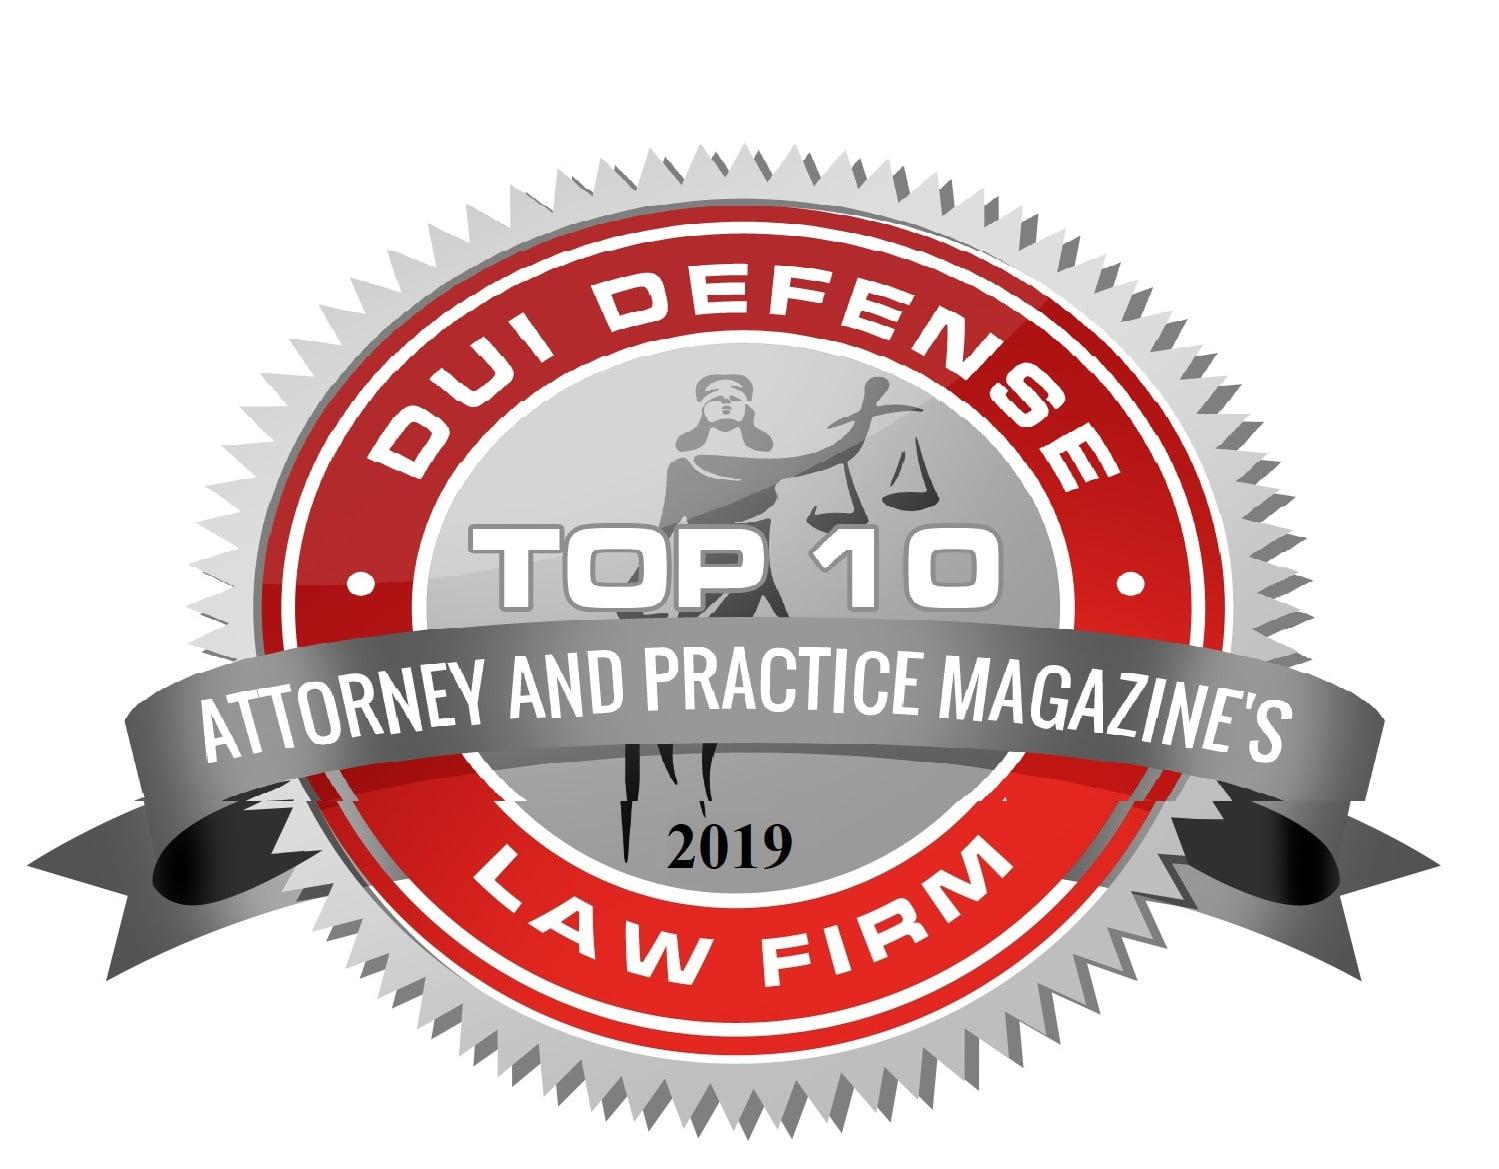 DUI Defense Law Firm Badge, Is a Previous DUI Reasonable Suspicion?